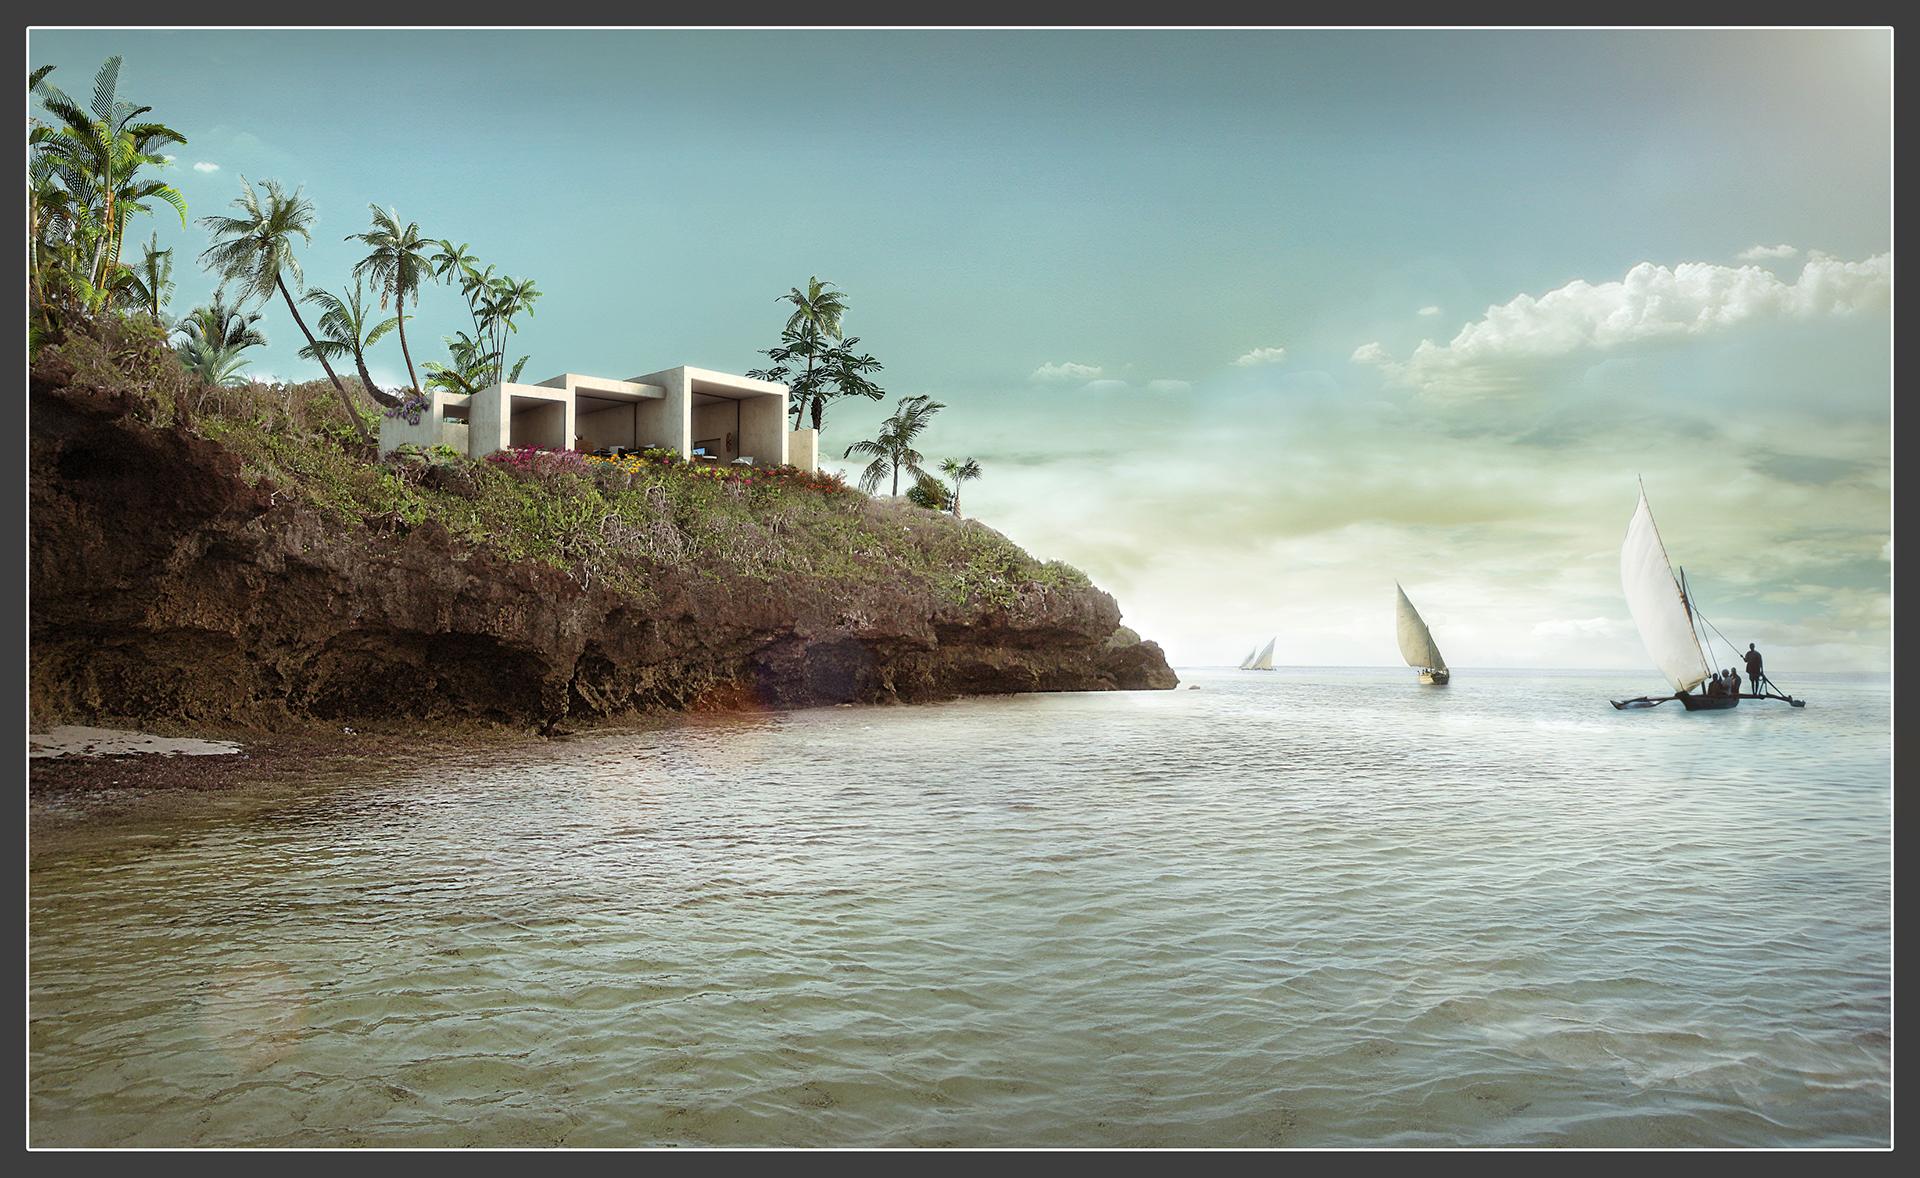 Vipingo_Cliff House. Kenia